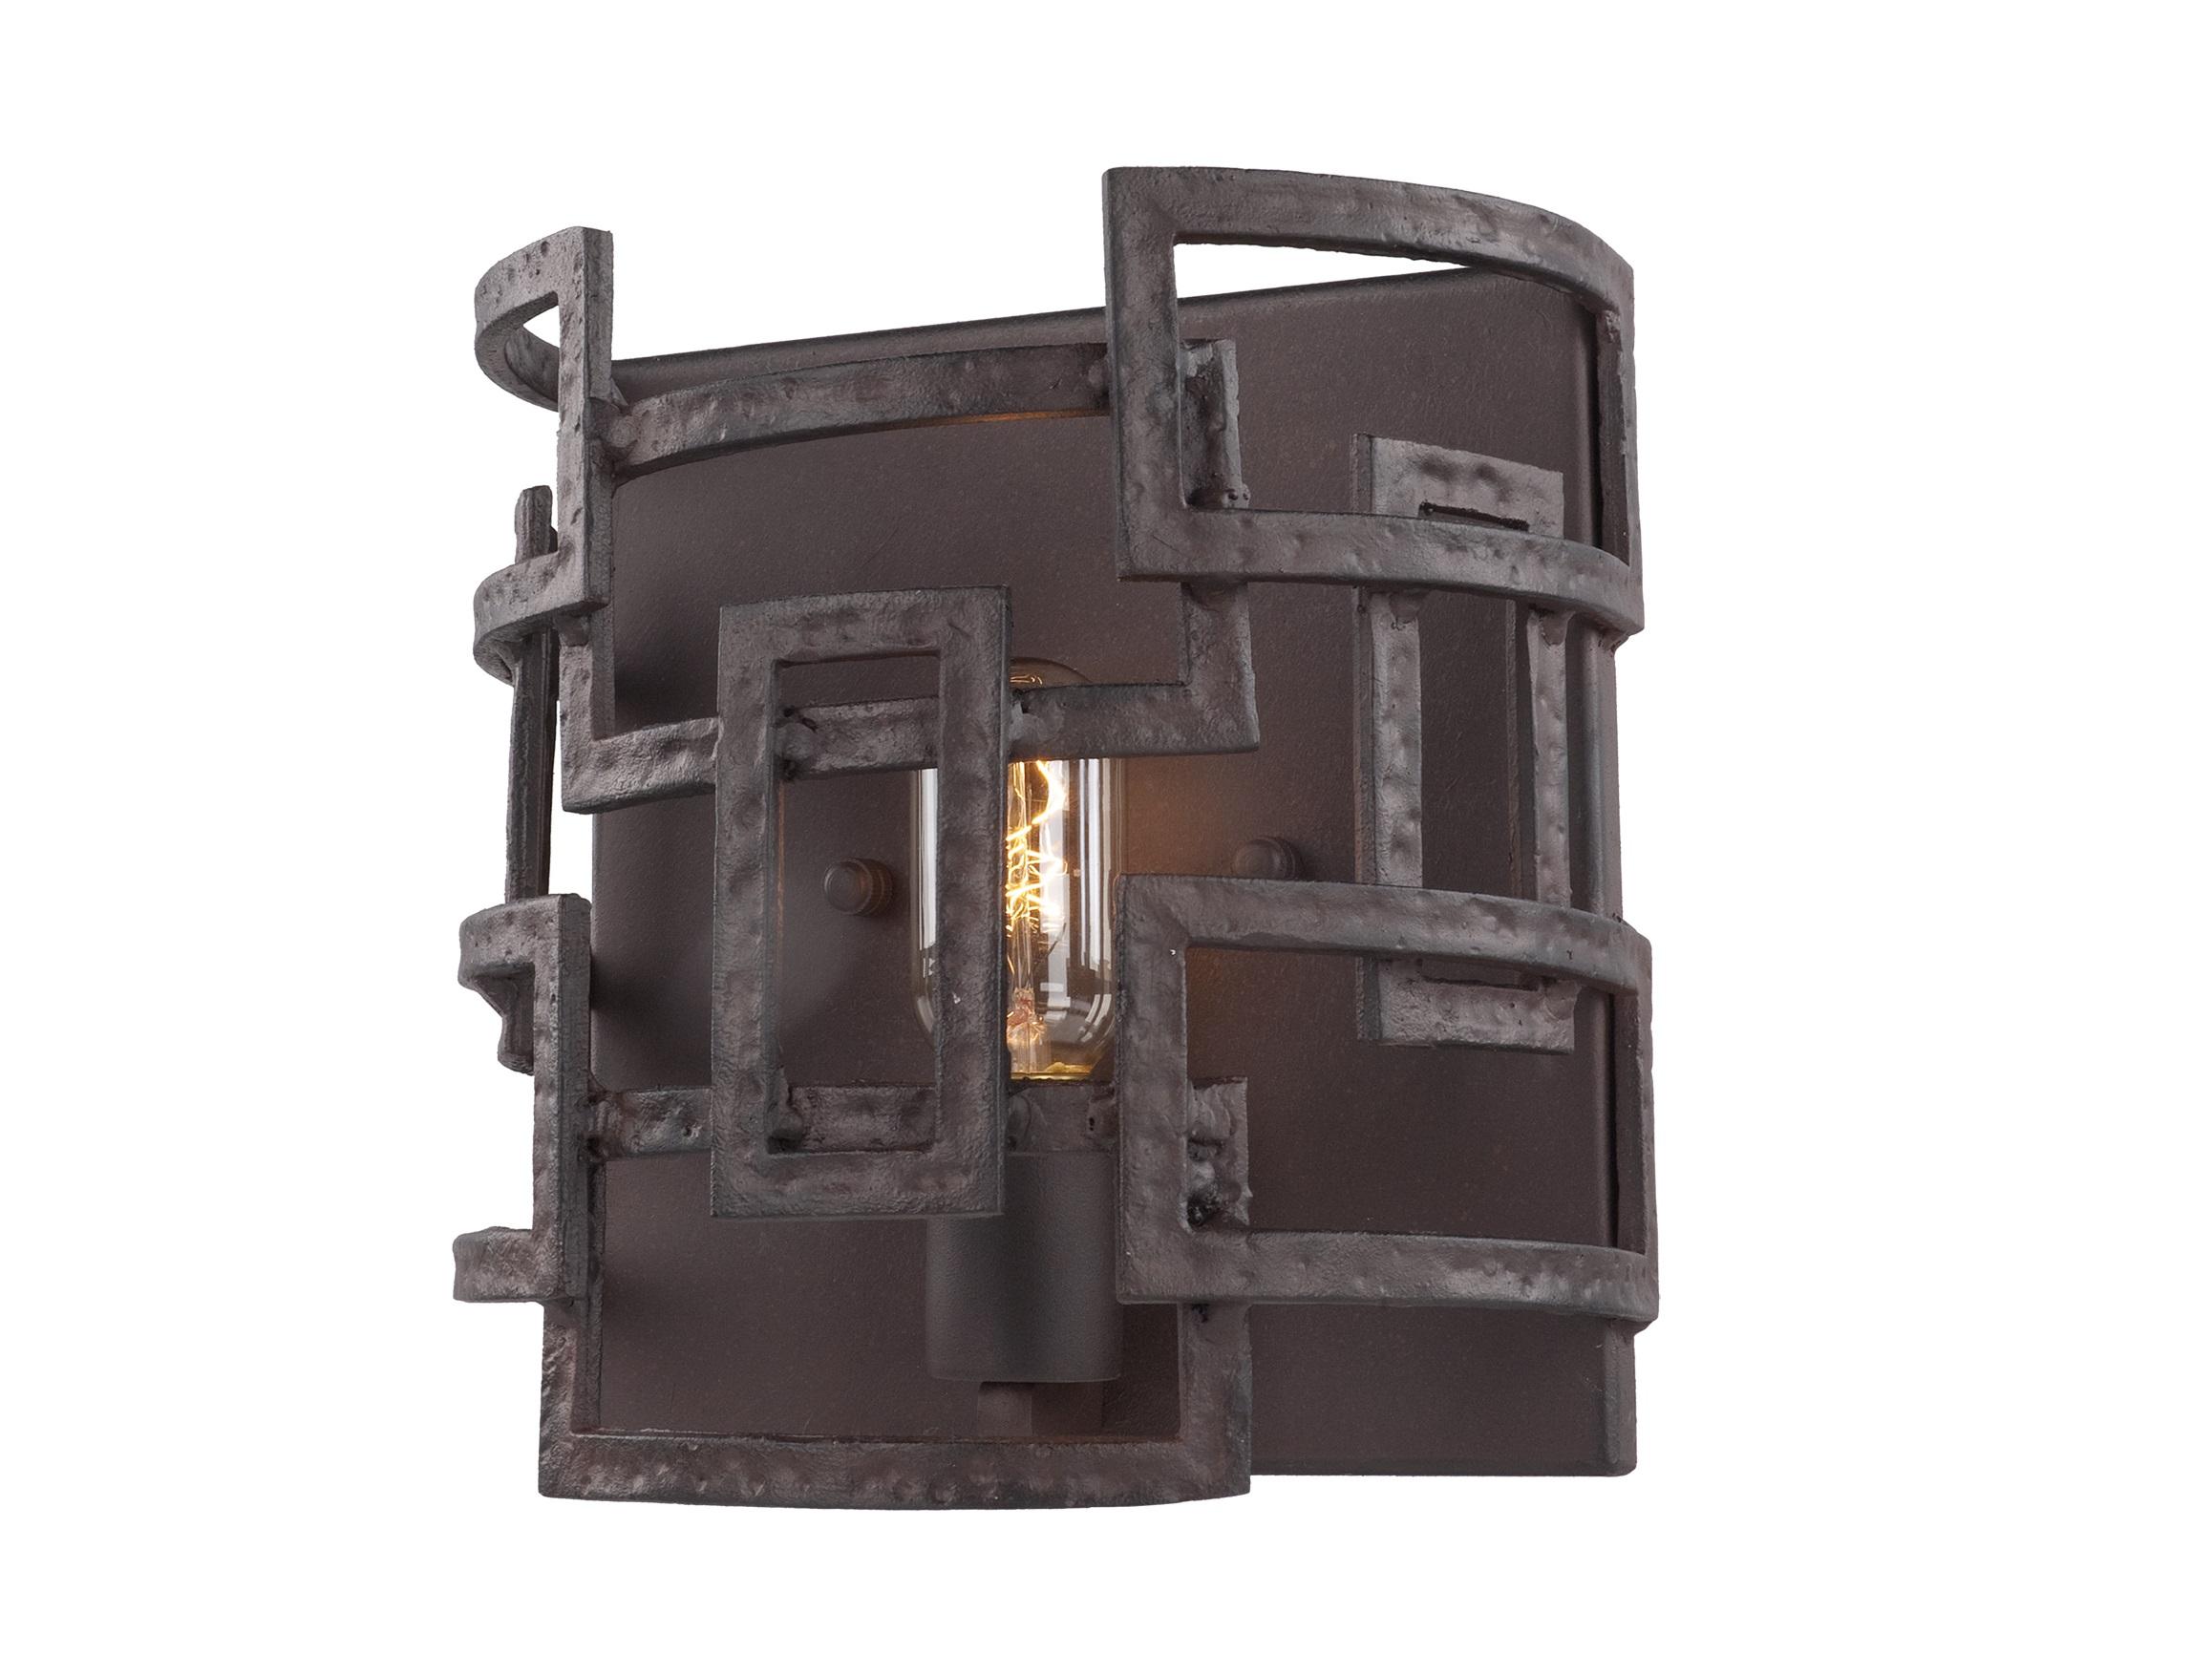 Настенный светильникБра<br>&amp;lt;div&amp;gt;Вид цоколя: E27&amp;lt;/div&amp;gt;&amp;lt;div&amp;gt;Мощность: &amp;amp;nbsp;40W&amp;amp;nbsp;&amp;lt;/div&amp;gt;&amp;lt;div&amp;gt;Количество ламп: 1 (есть в комплекте)&amp;lt;/div&amp;gt;<br><br>Material: Металл<br>Length см: None<br>Width см: 24<br>Depth см: 14<br>Height см: 24